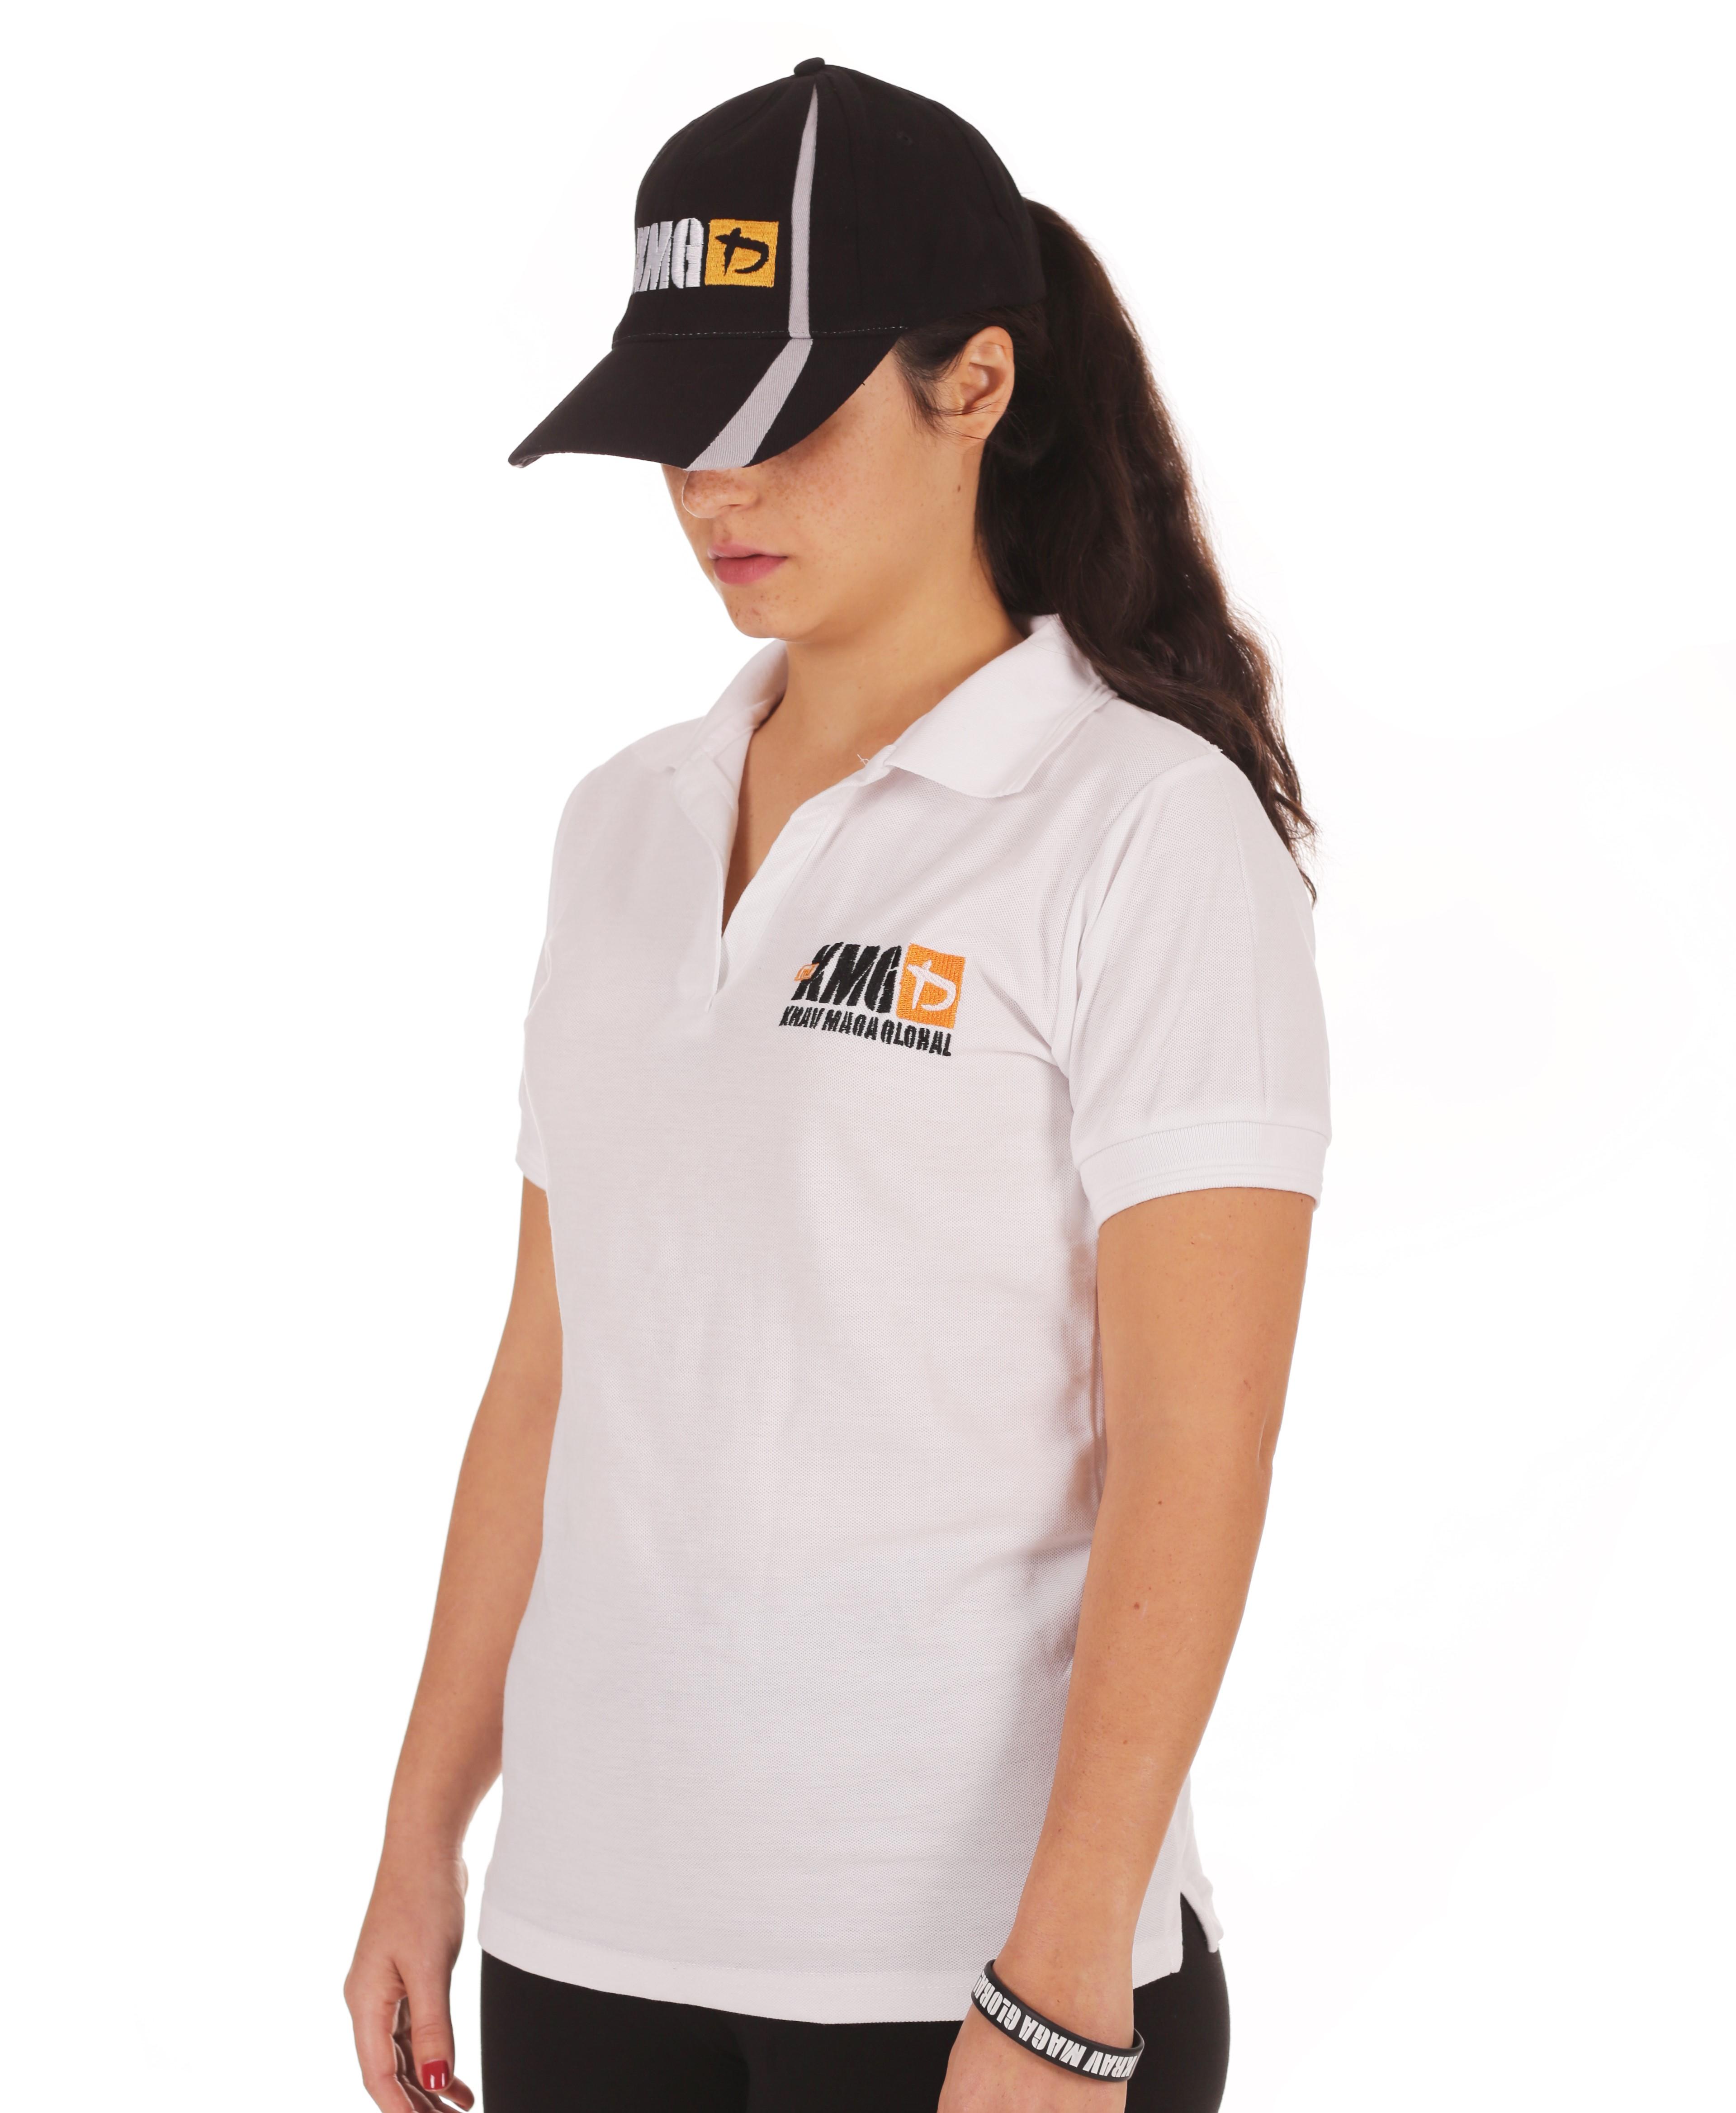 Polo Shirt for women - Side